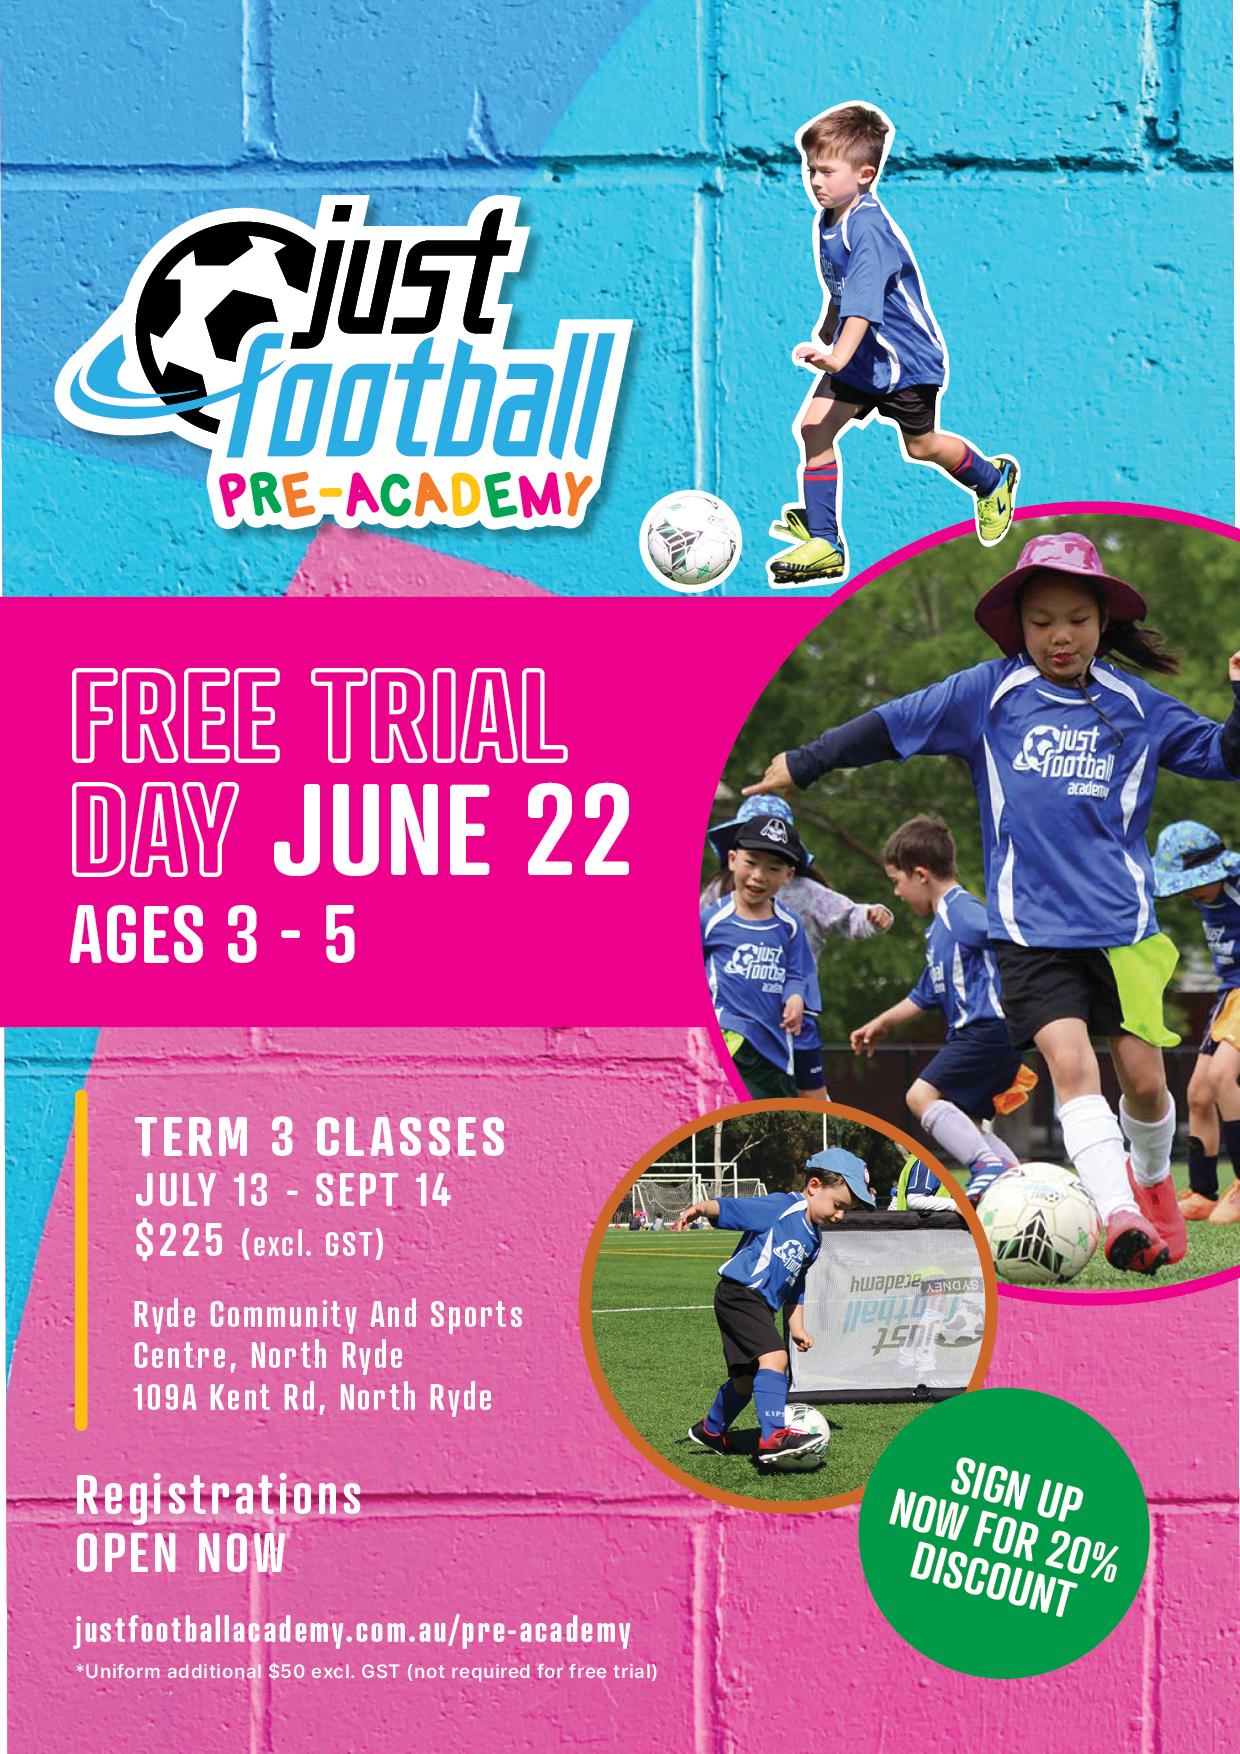 https://justfootballacademy.com.au/wp-content/uploads/2021/05/JFA-pre-academy-poster_A4-FA.jpg